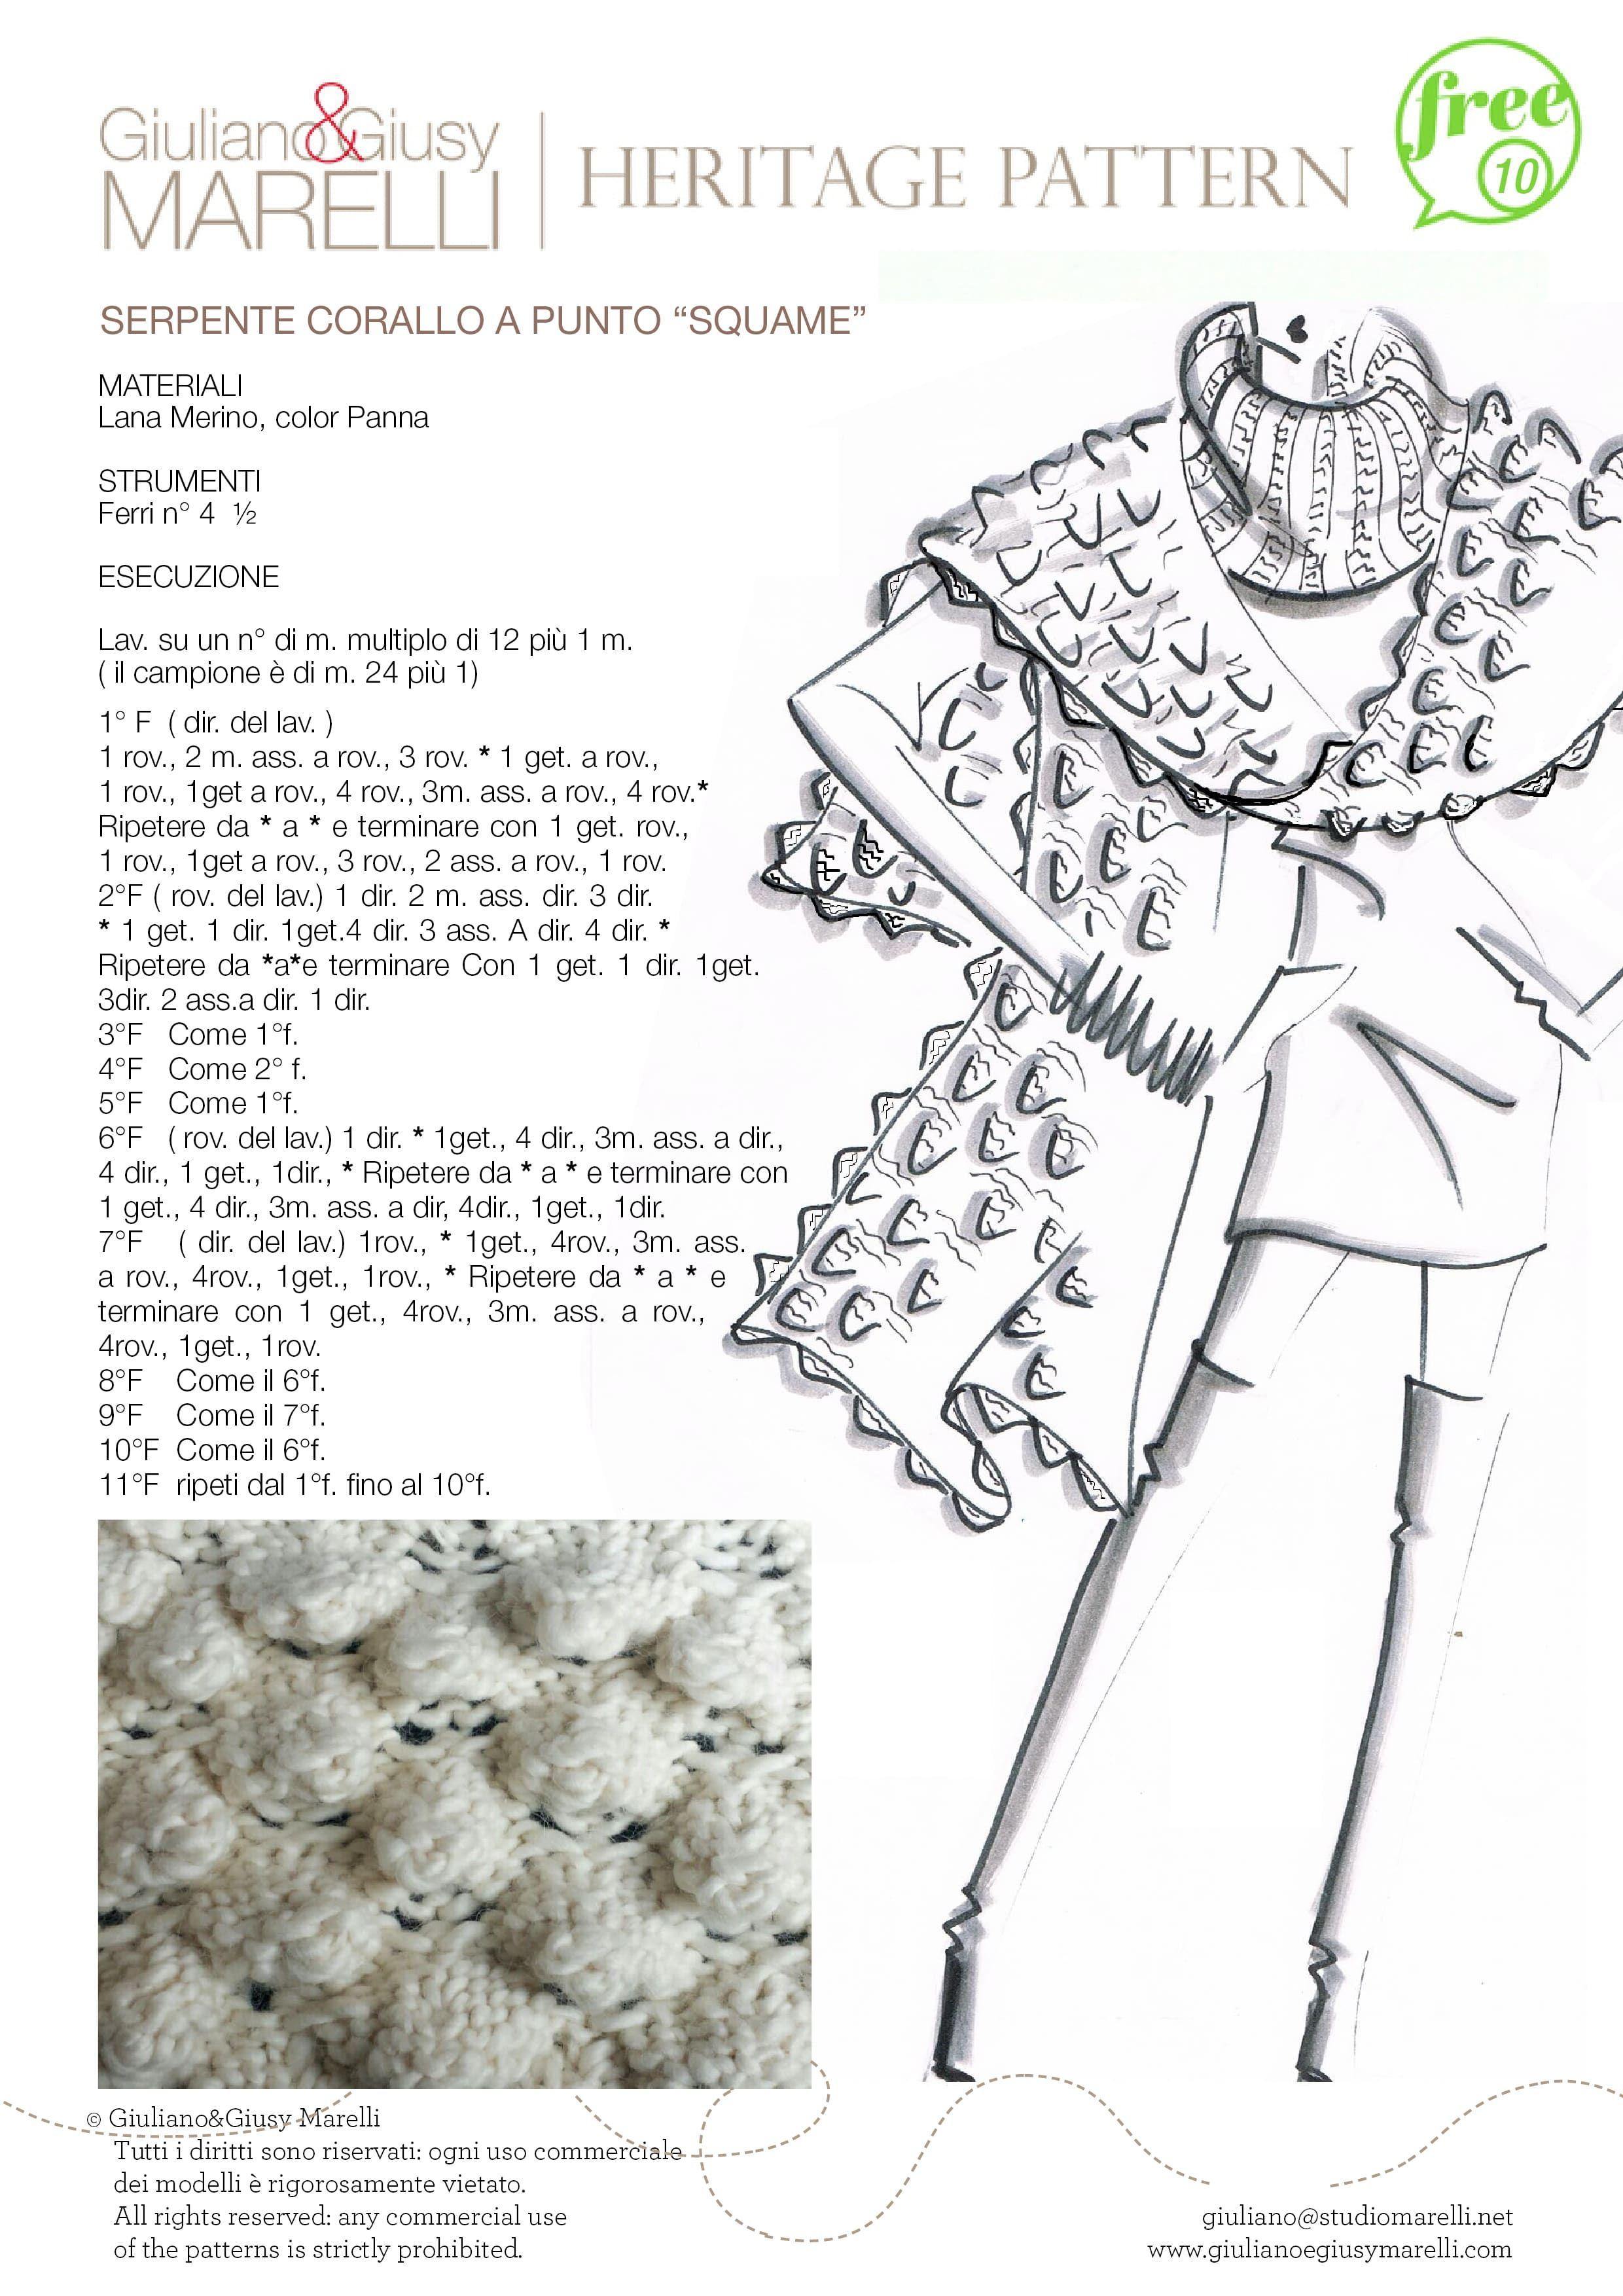 Punti Heritage 10 - PUNTO SQUAME.jpg | tejido, costura, estilo ...